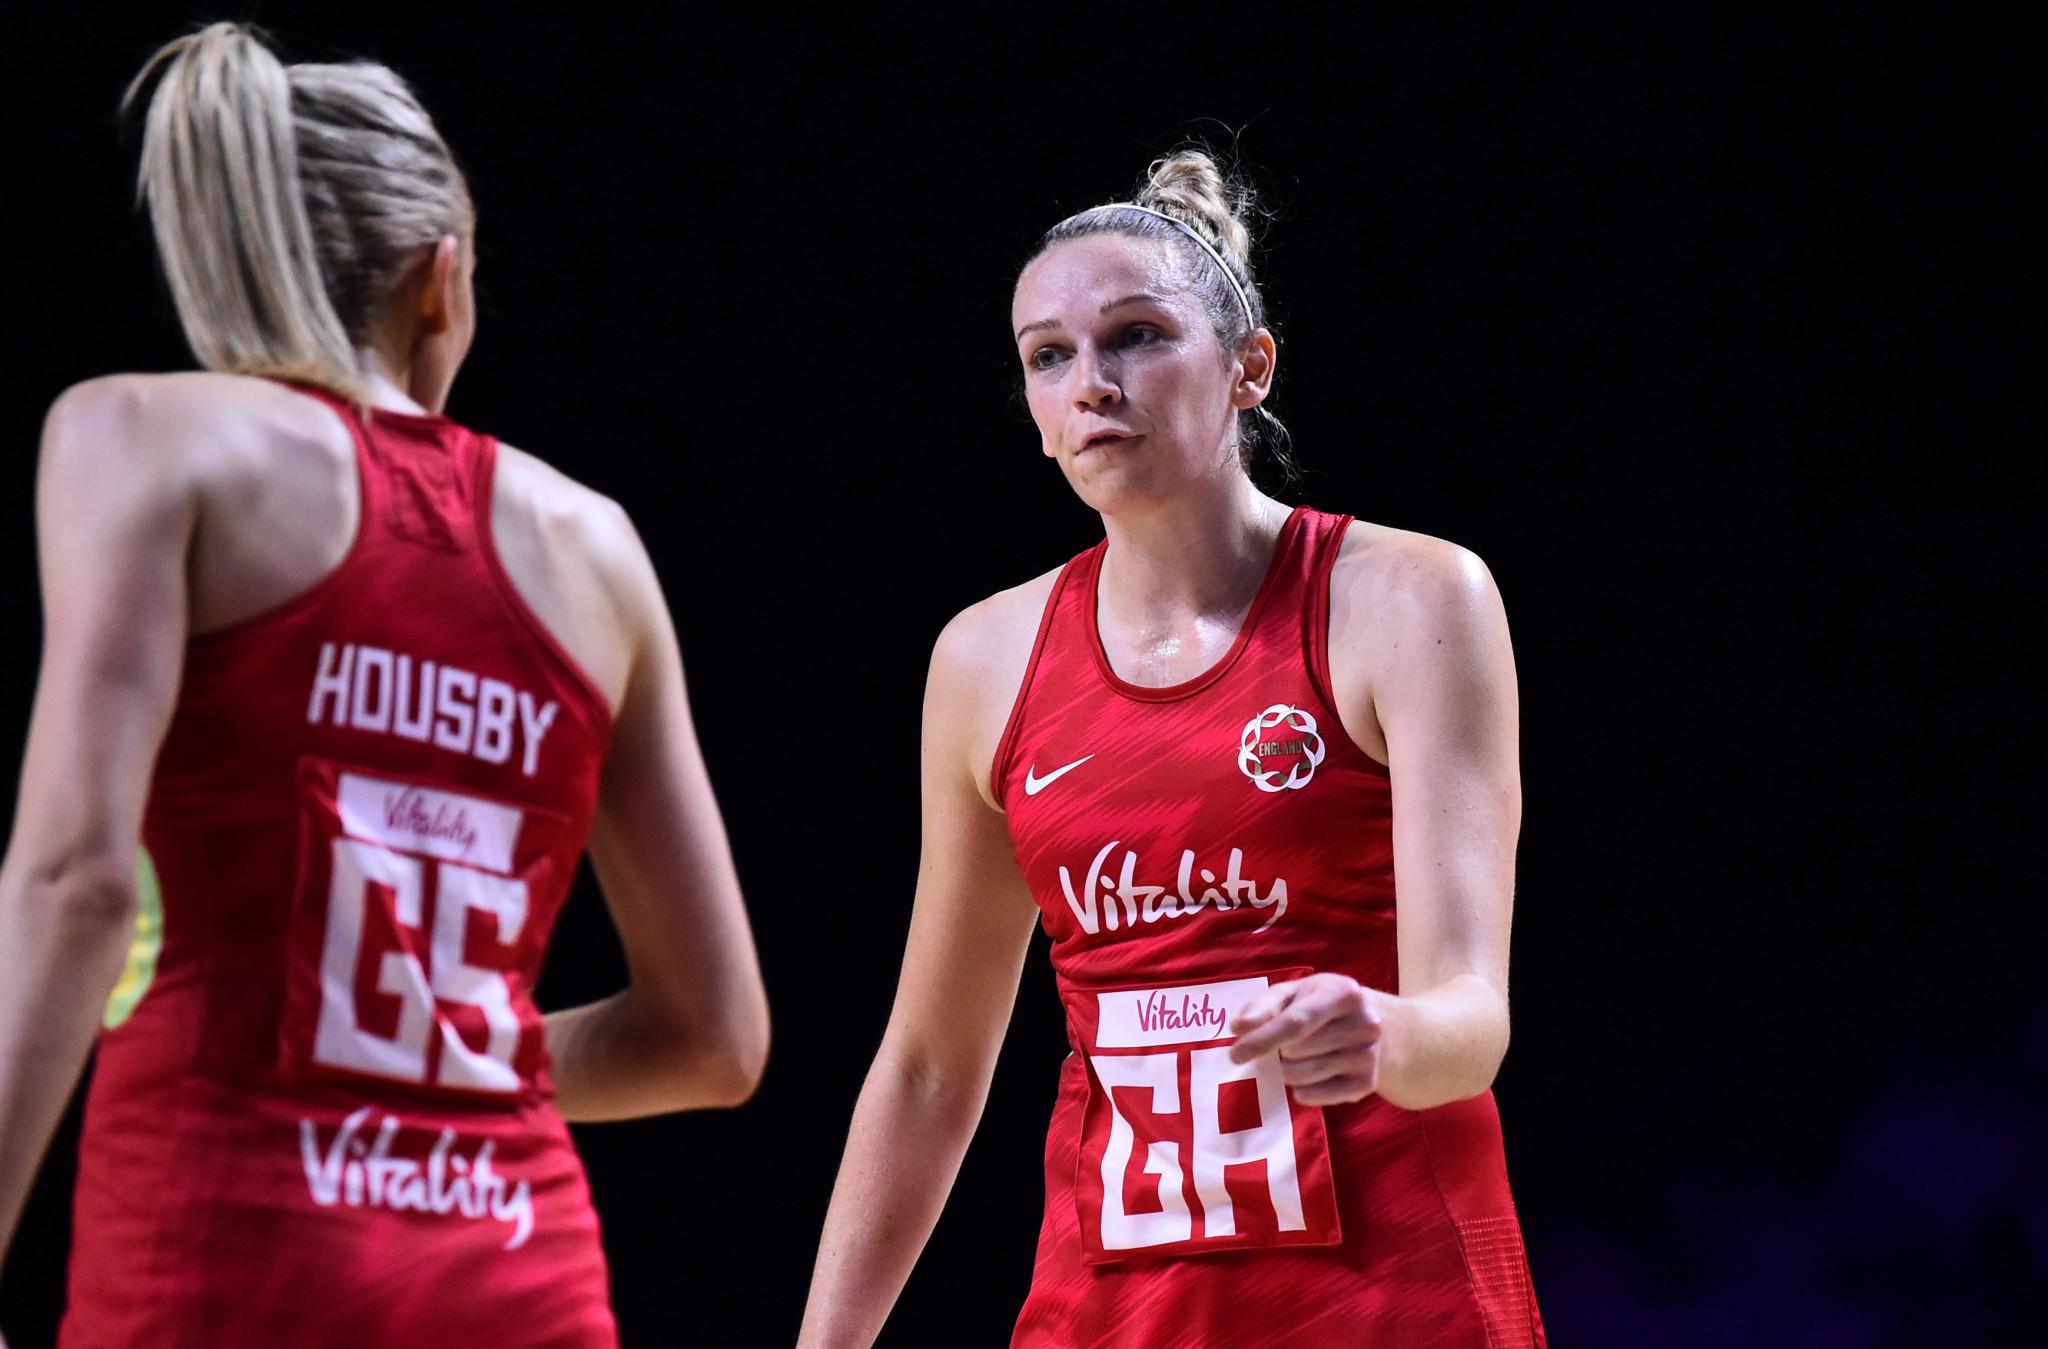 England climb back to third in latest International Netball Federation rankings